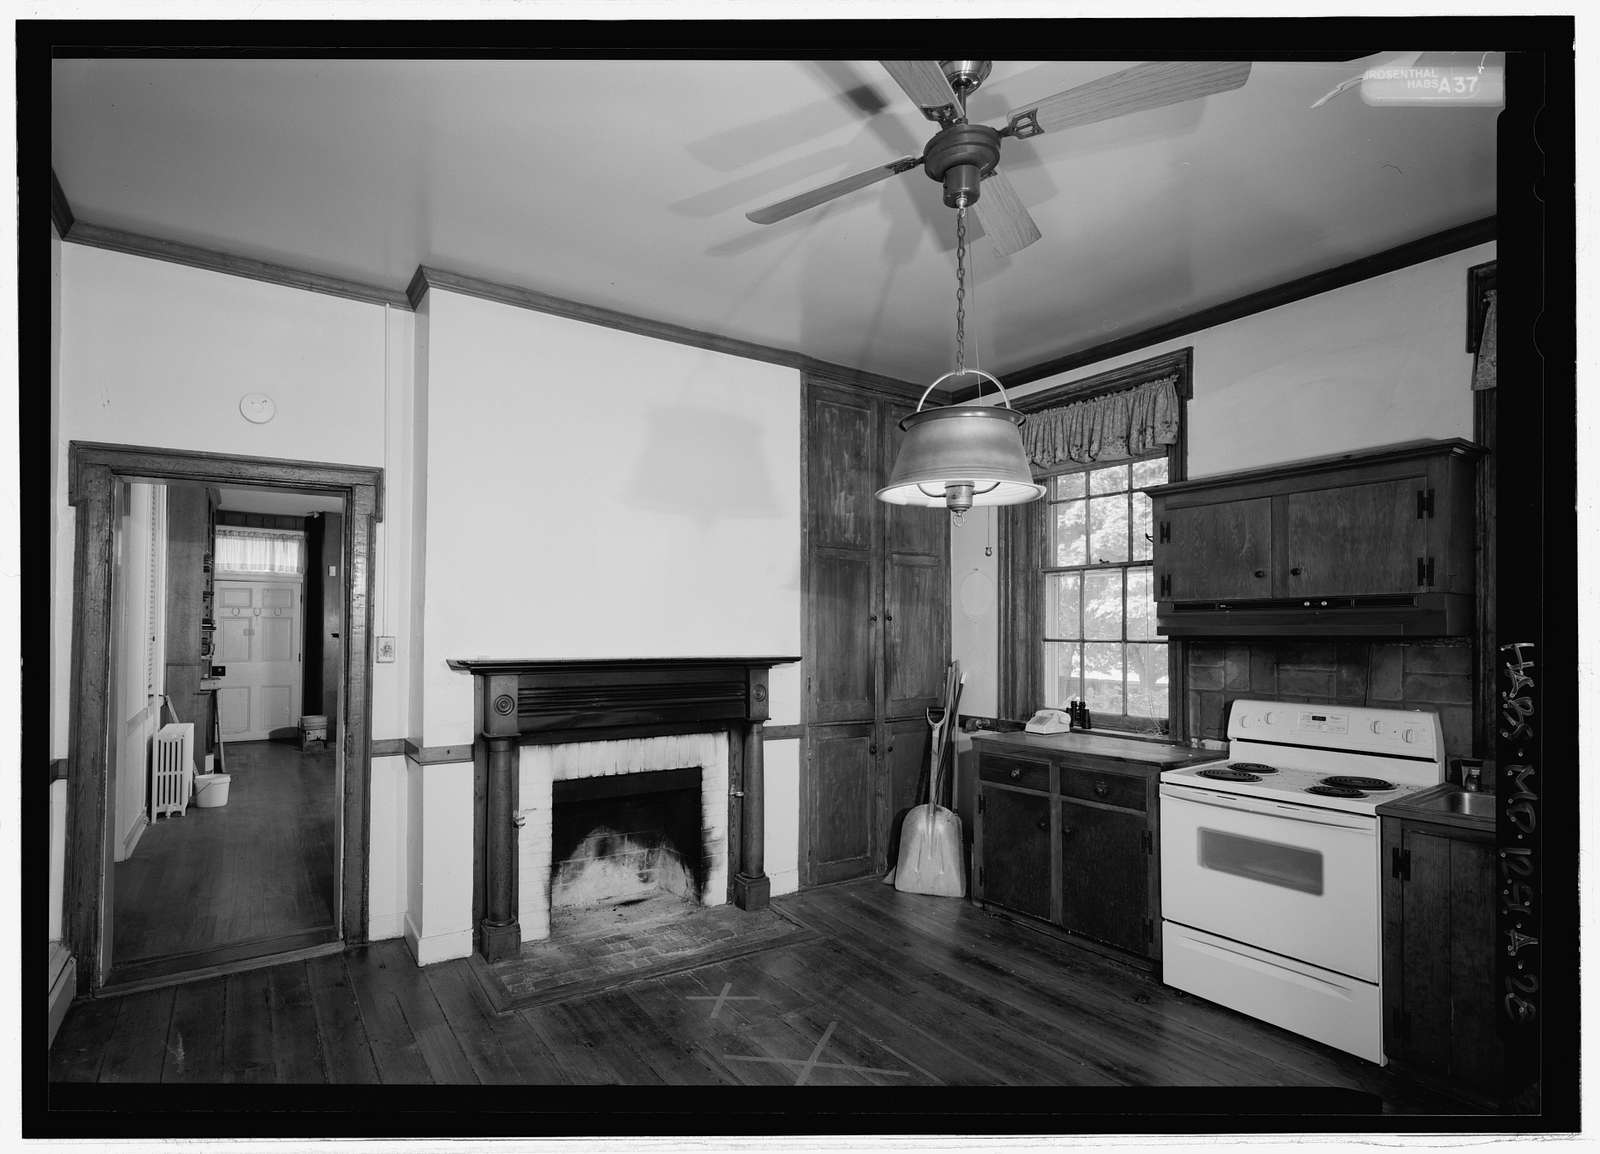 Thomas Farm, House, 4632 Araby Church Road, Frederick, Frederick County, MD